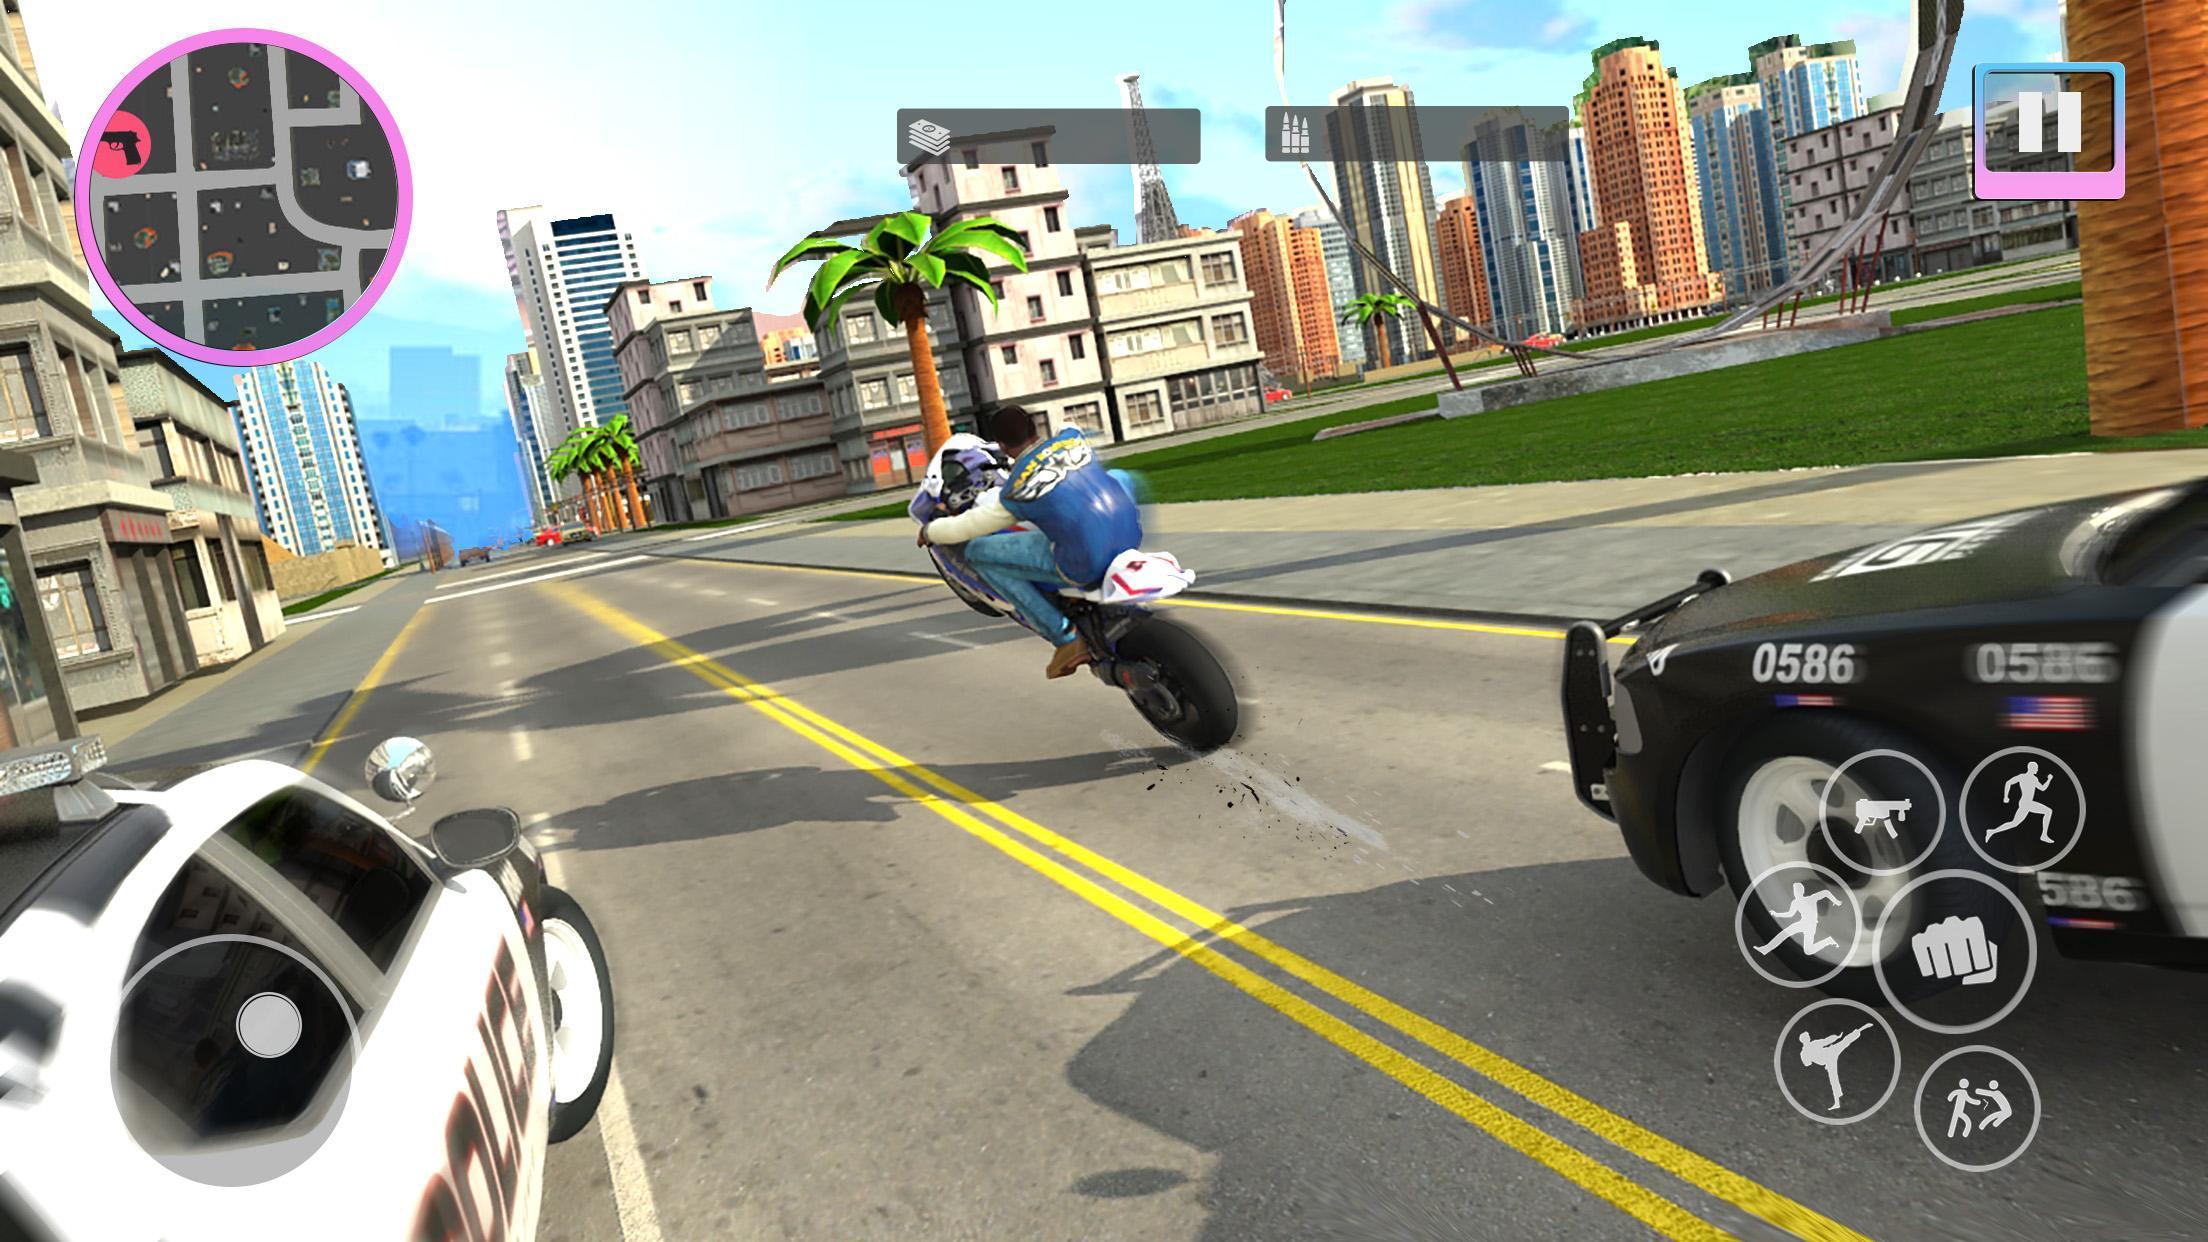 Grand City Robbery Crime Mafia Gangster Kill Game for